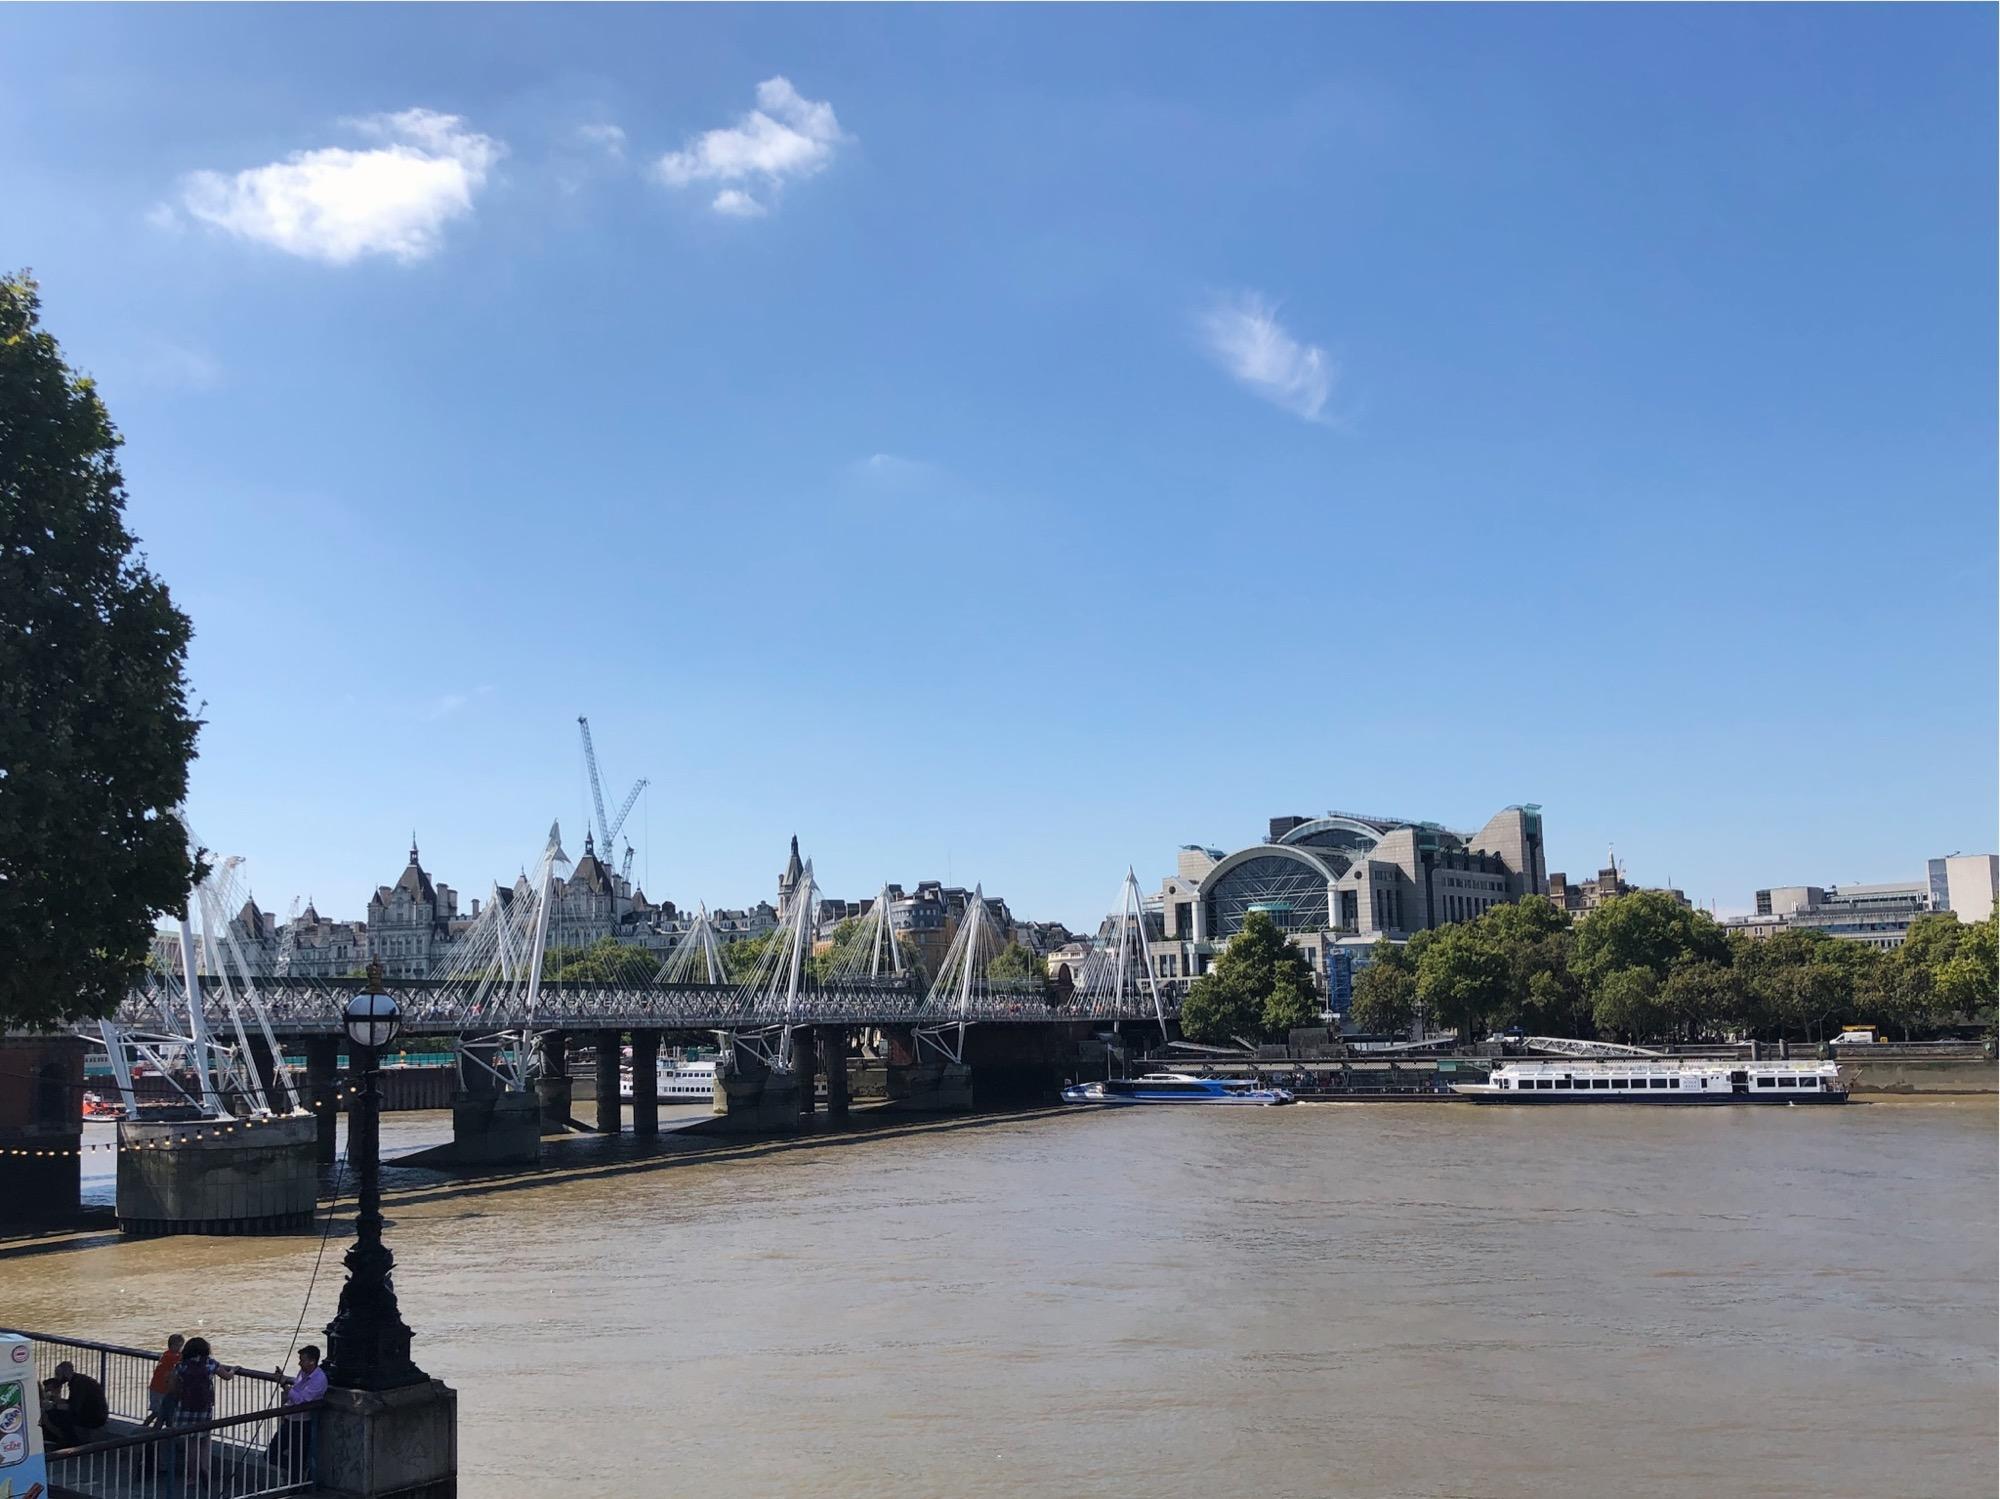 london by ross farley.jpg